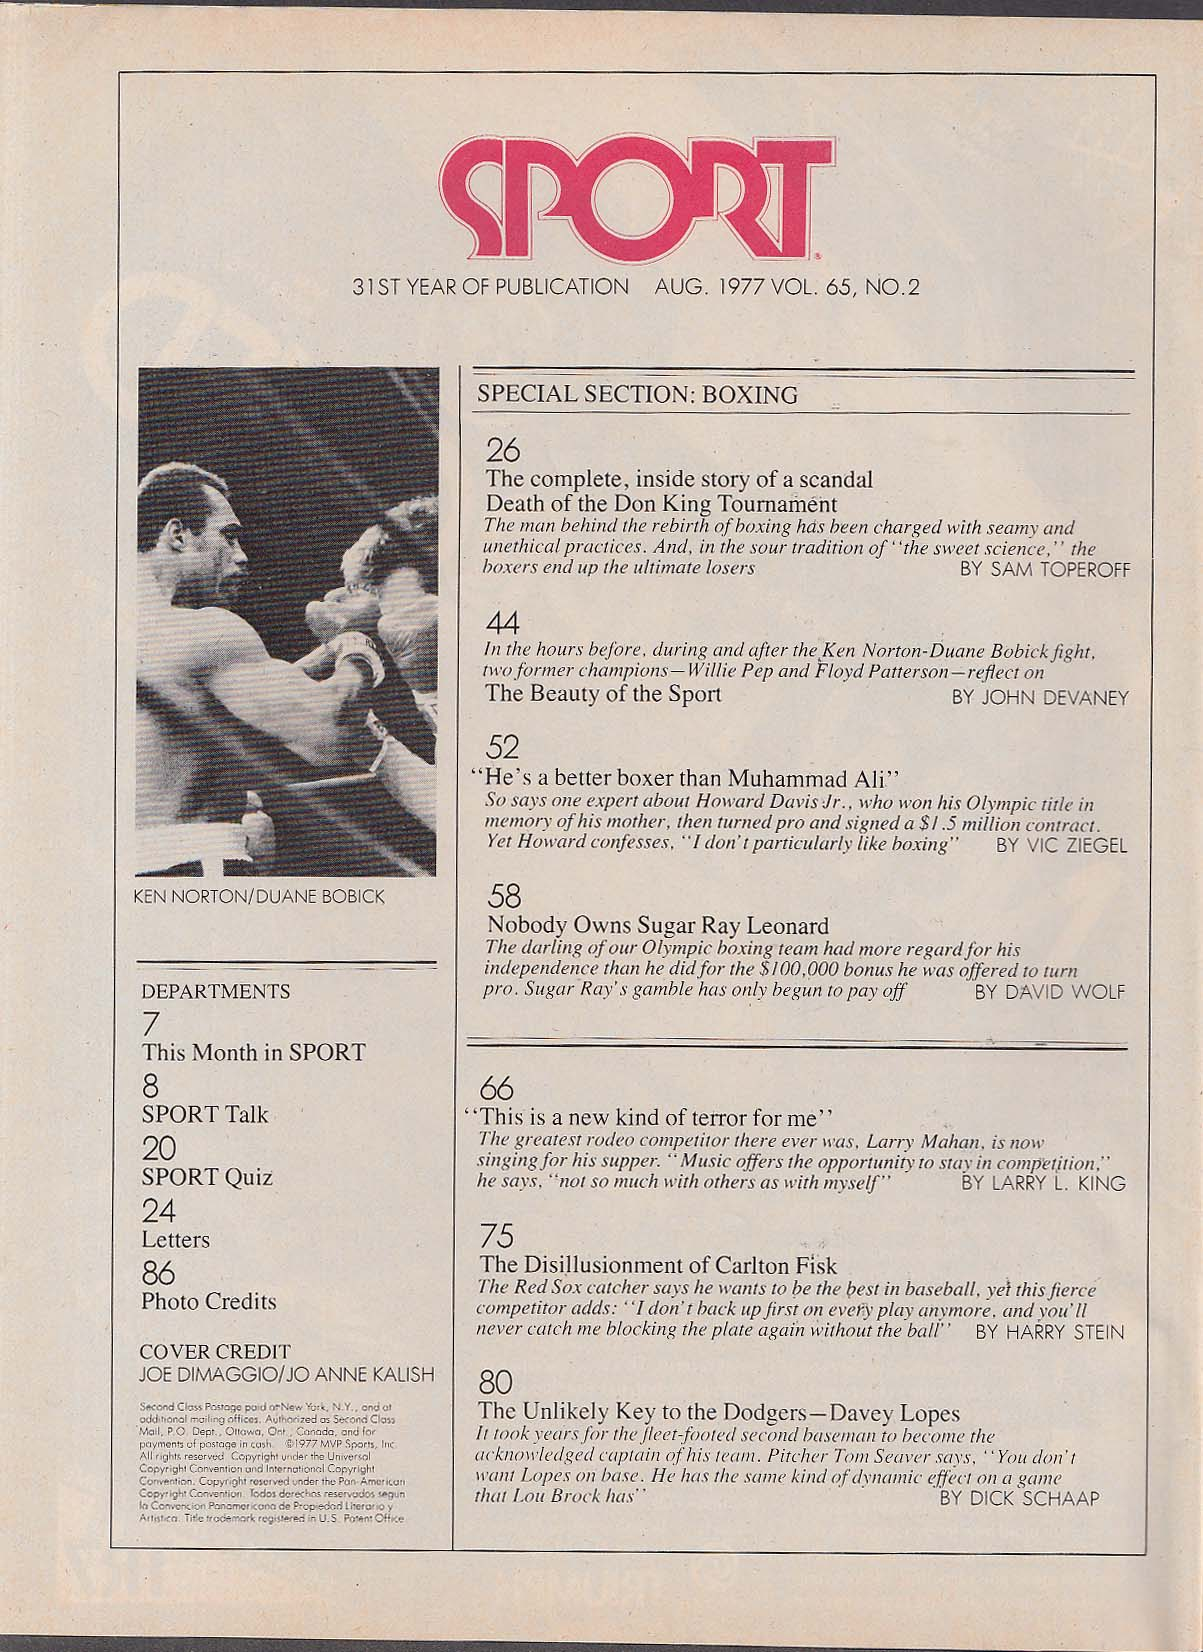 SPORT Don King scandal, Davey Lopes 8 1977